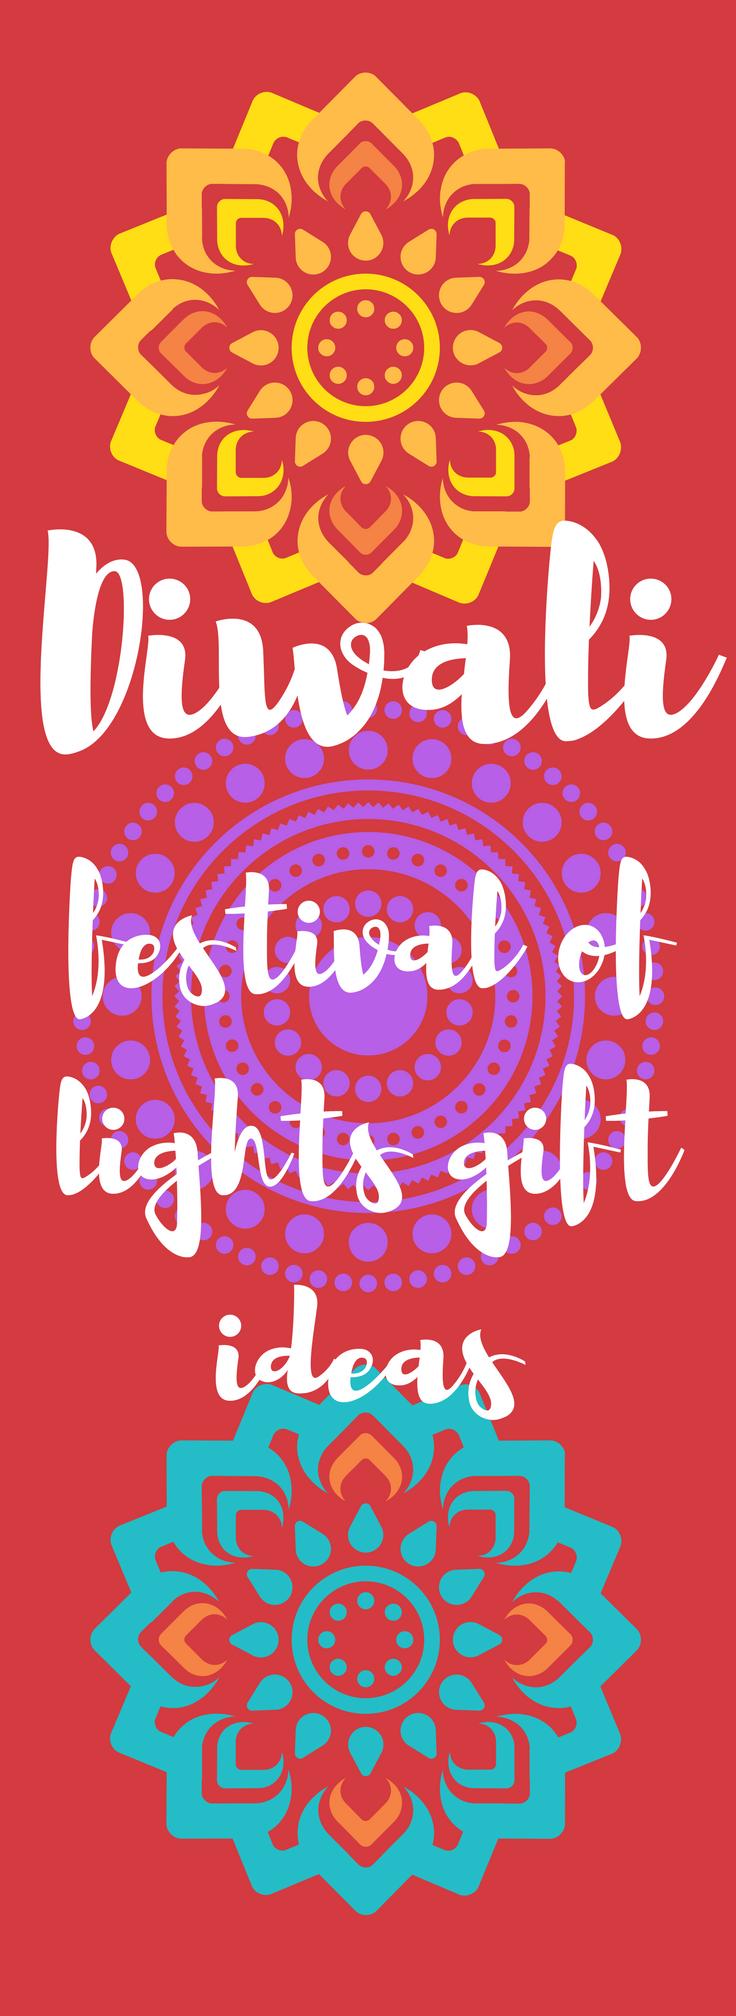 Diwali Festival Of Lights Gift Ideas Diwali Festival Of